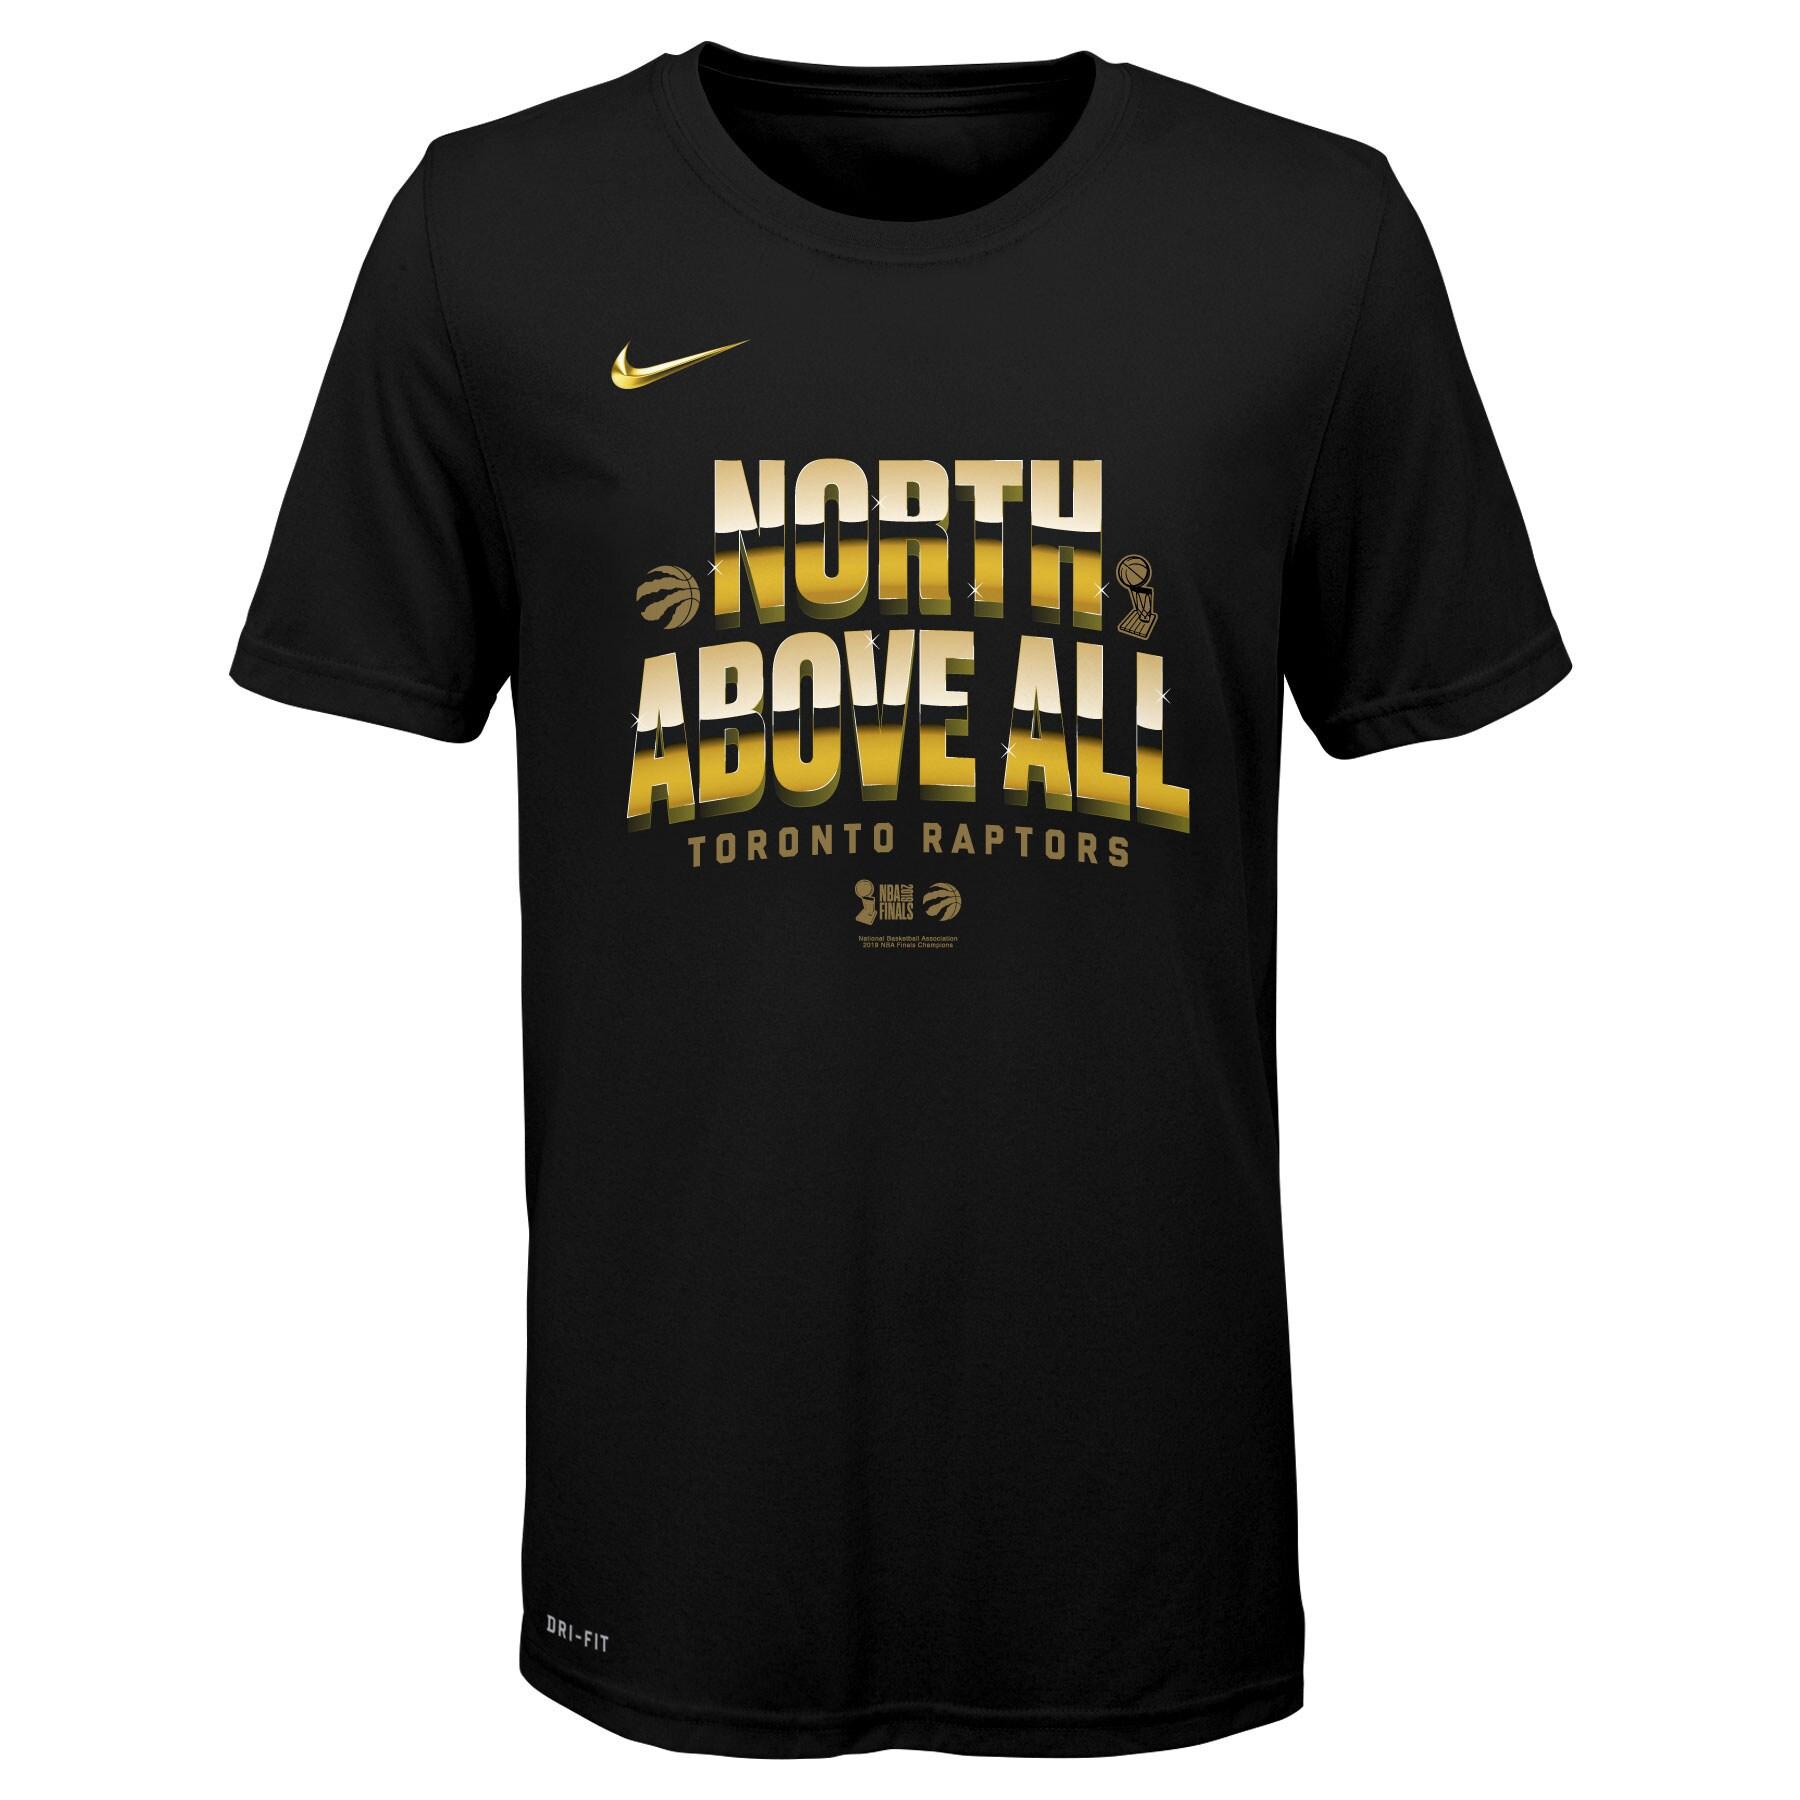 Toronto Raptors Nike Youth 2019 NBA Finals Champions Celebration Mantra T-Shirt - Black